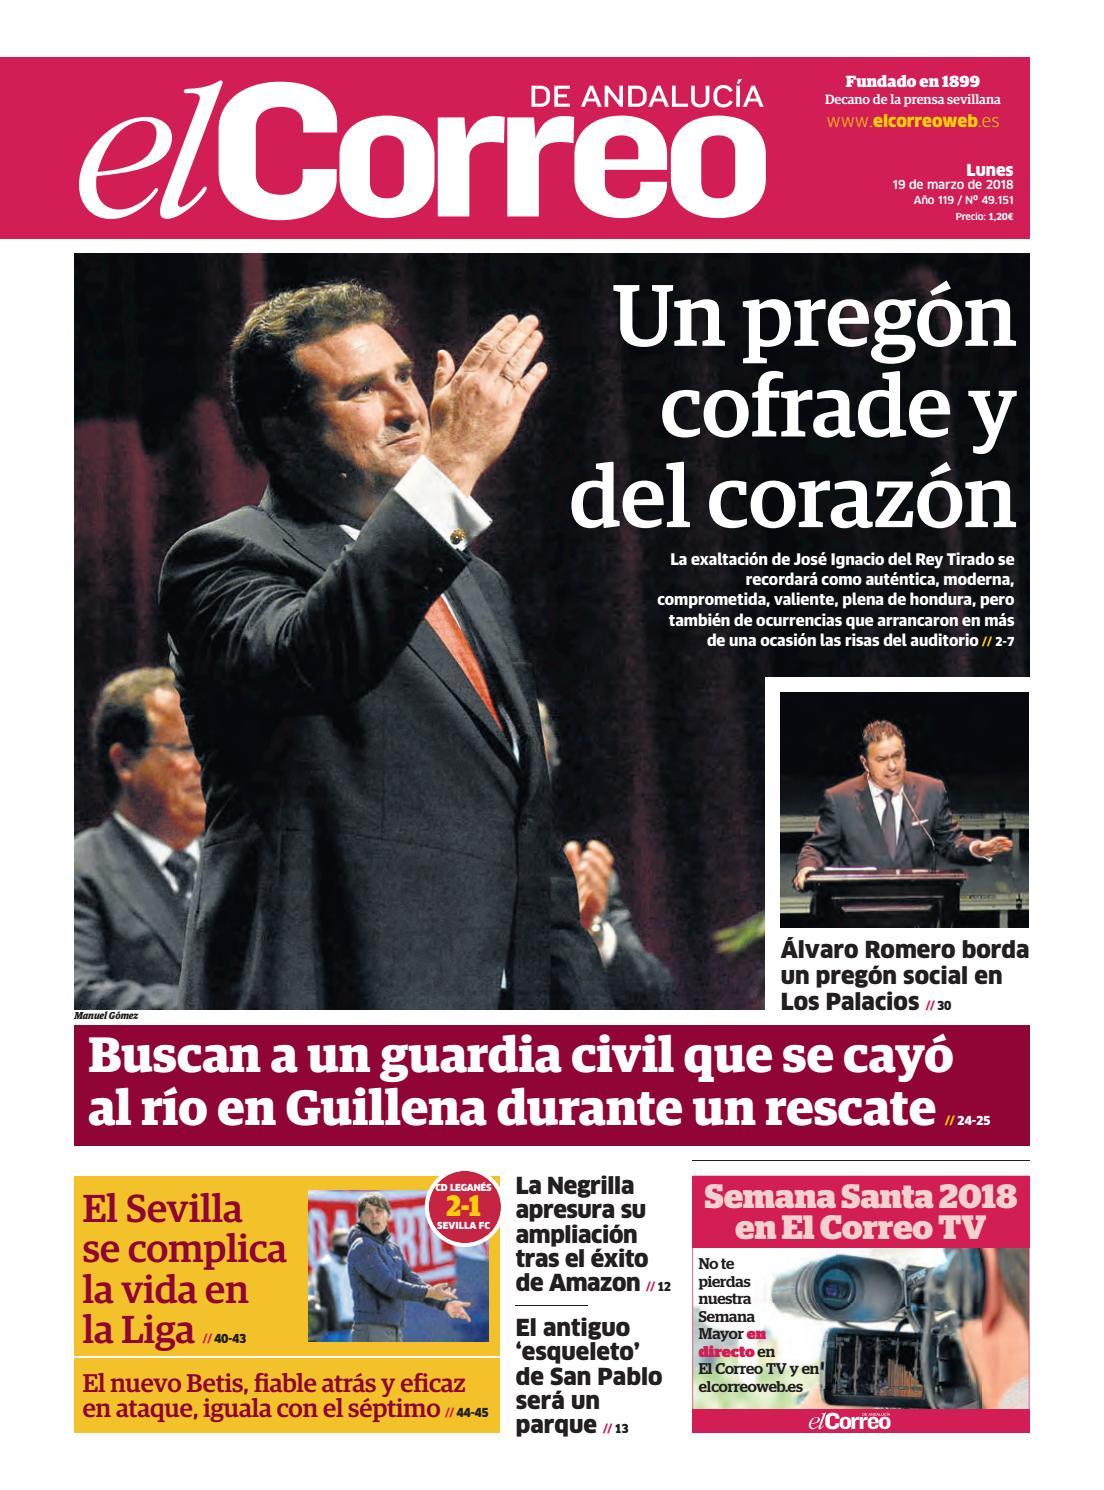 19.03.2018 El Correo de Andalucía by EL CORREO DE ANDALUCÍA S.L. - issuu 36d4c5cfa0e